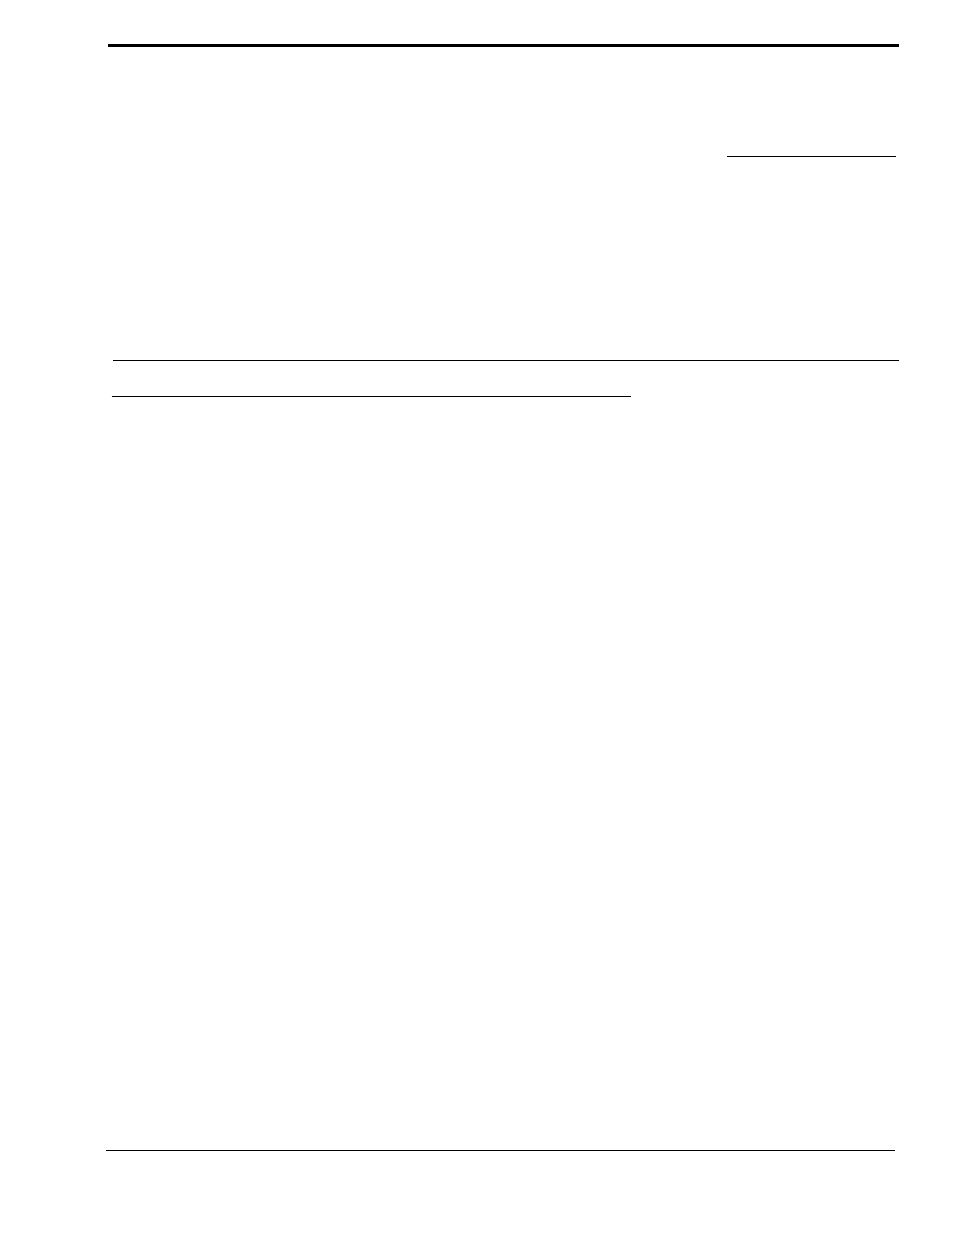 Chapter 5 update firmware, Update firmware, Install tsm | Telex IP